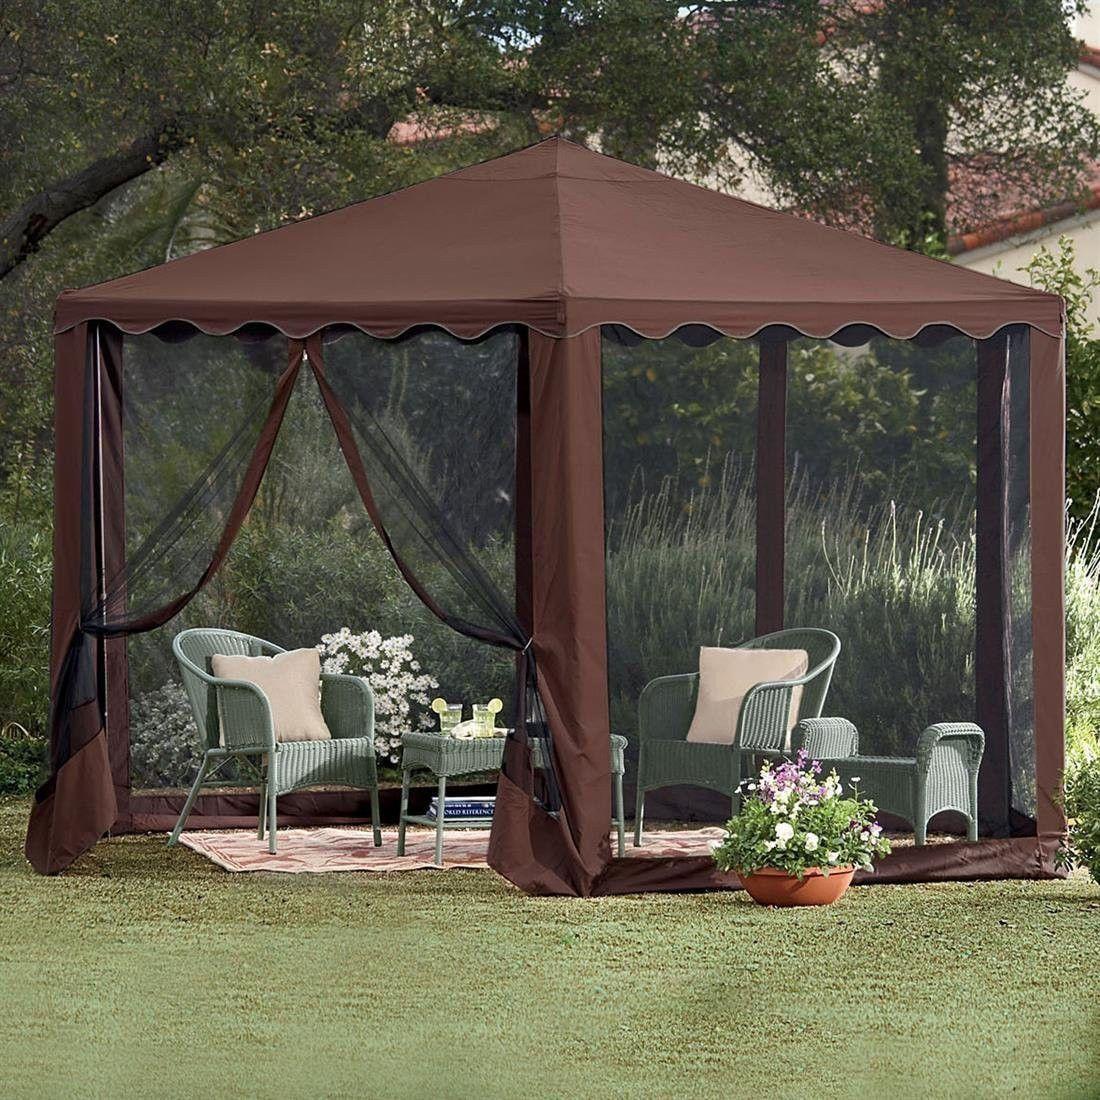 Lovely Outdoor Screened Gazebo 1 Tents